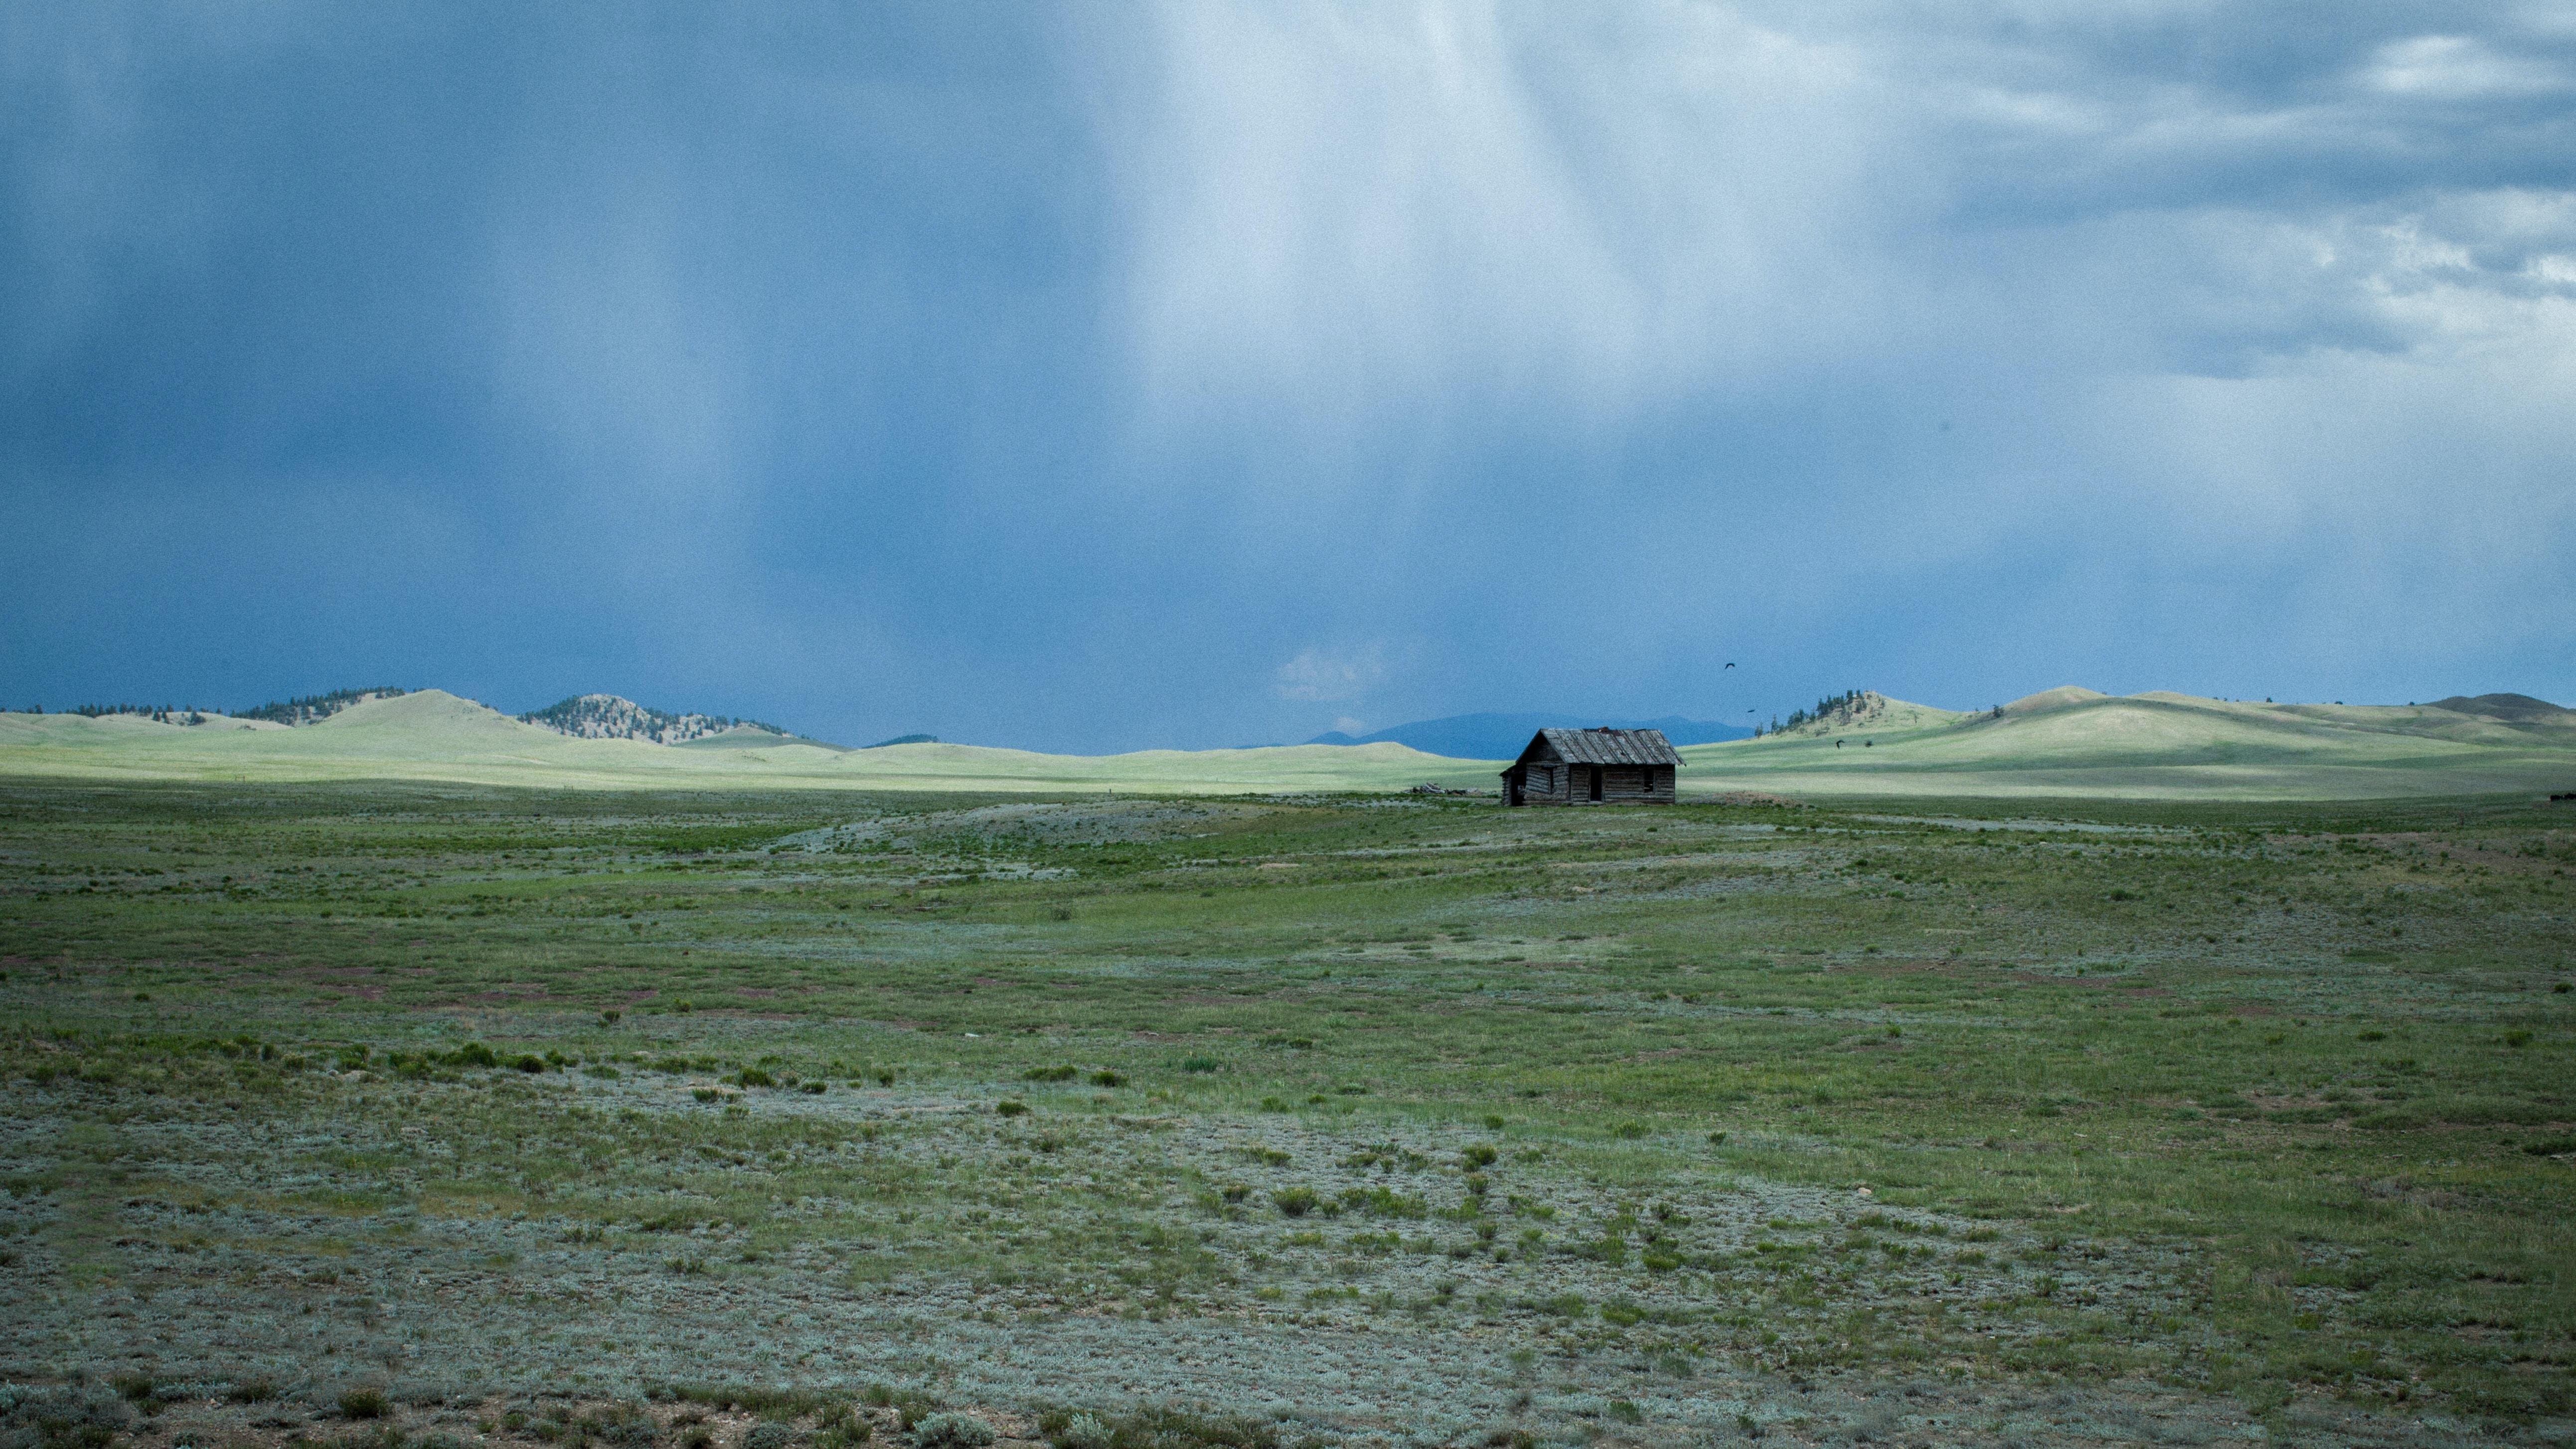 A bleak landscape with a wooden cabin on a desolate plain